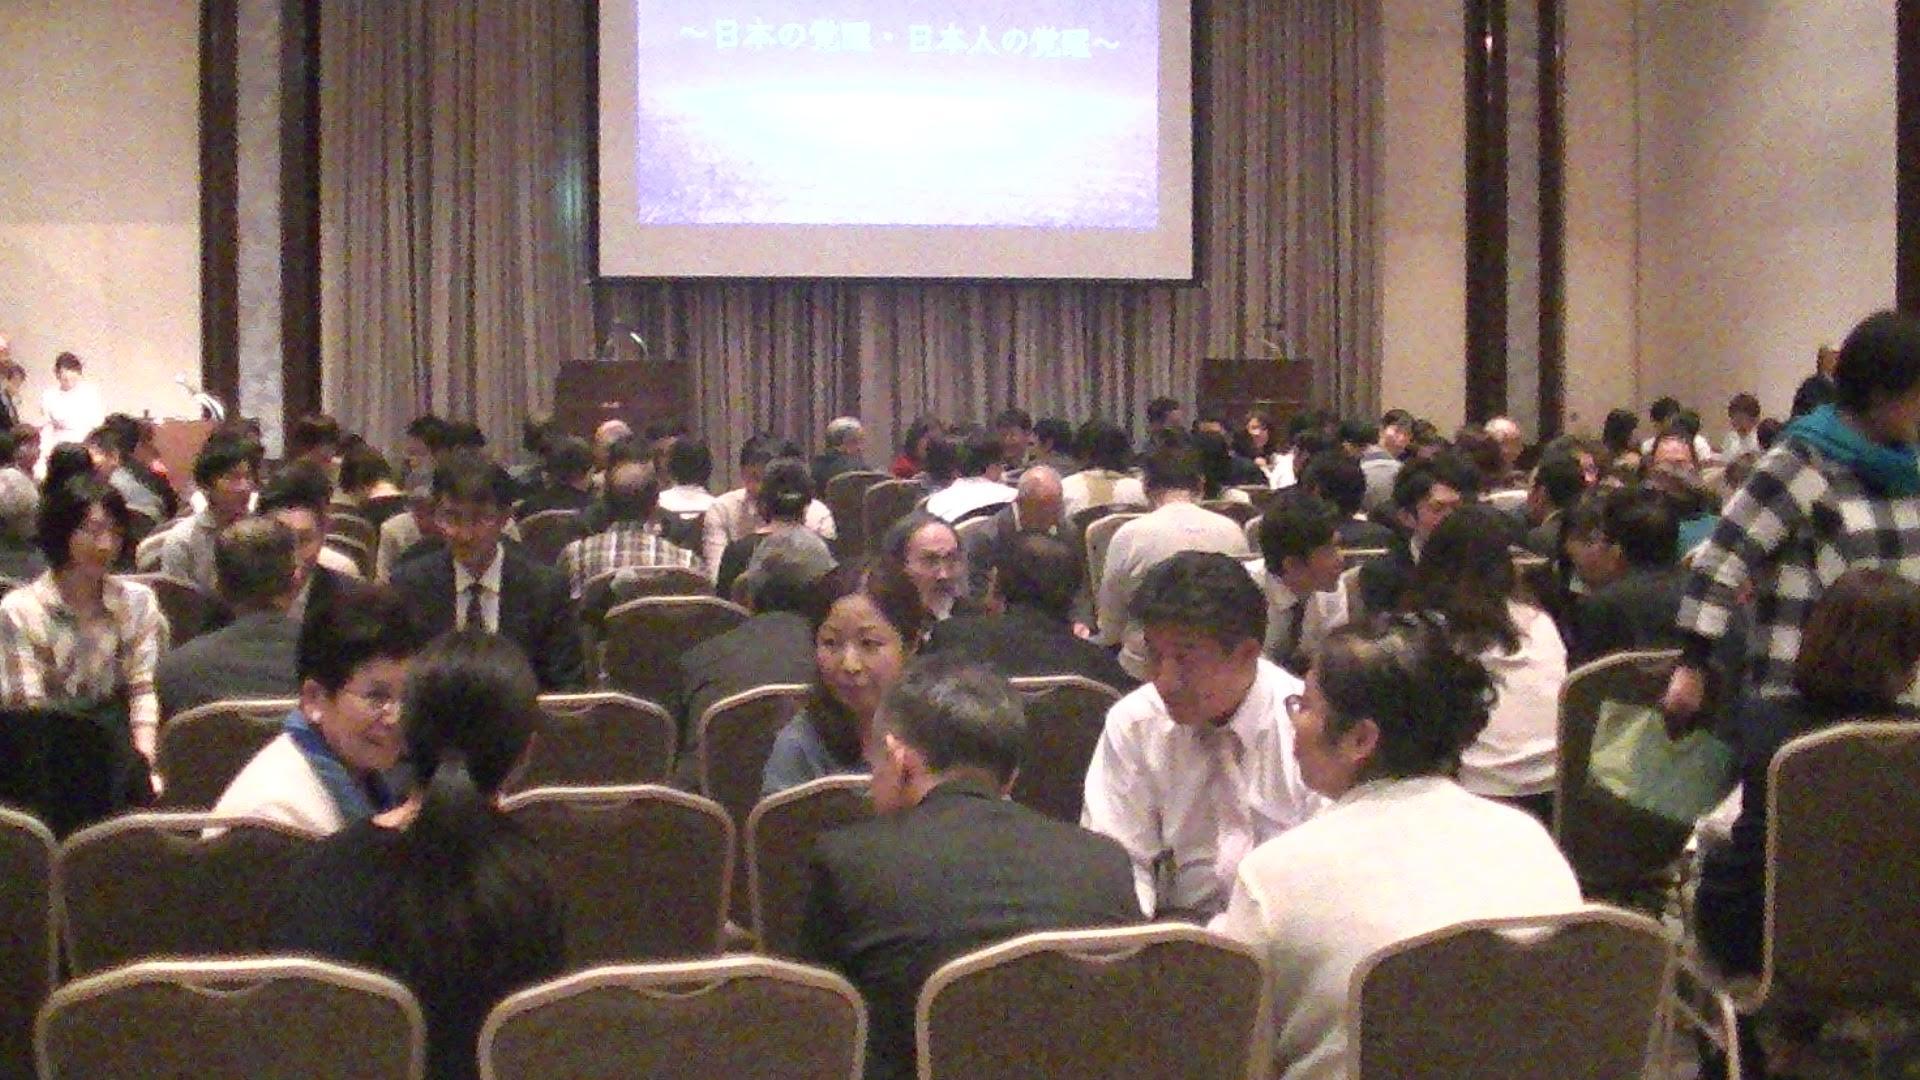 PIC 1754 1 - 思風会全国大会in広島